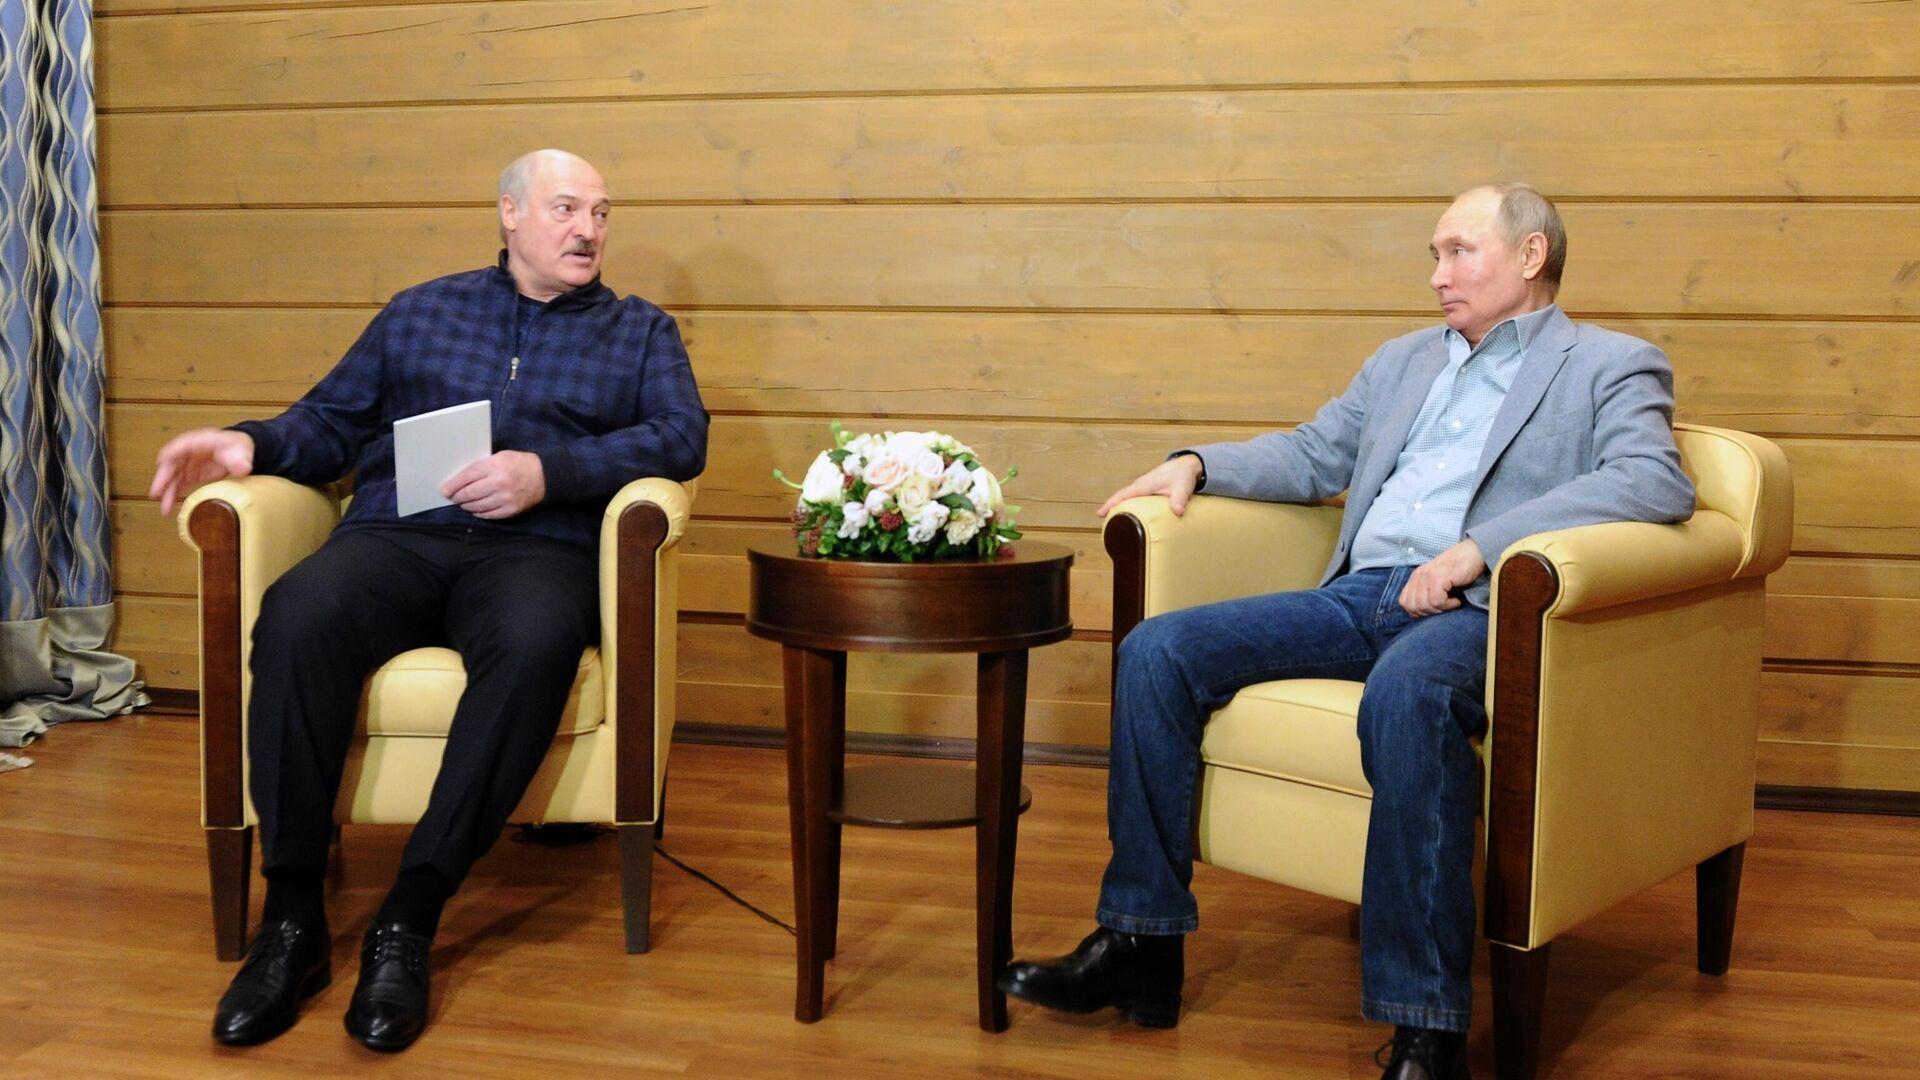 Президент РФ Владимир Путин и президент Белоруссии Александр Лукашенко во время встречи - РИА Новости, 1920, 23.02.2021